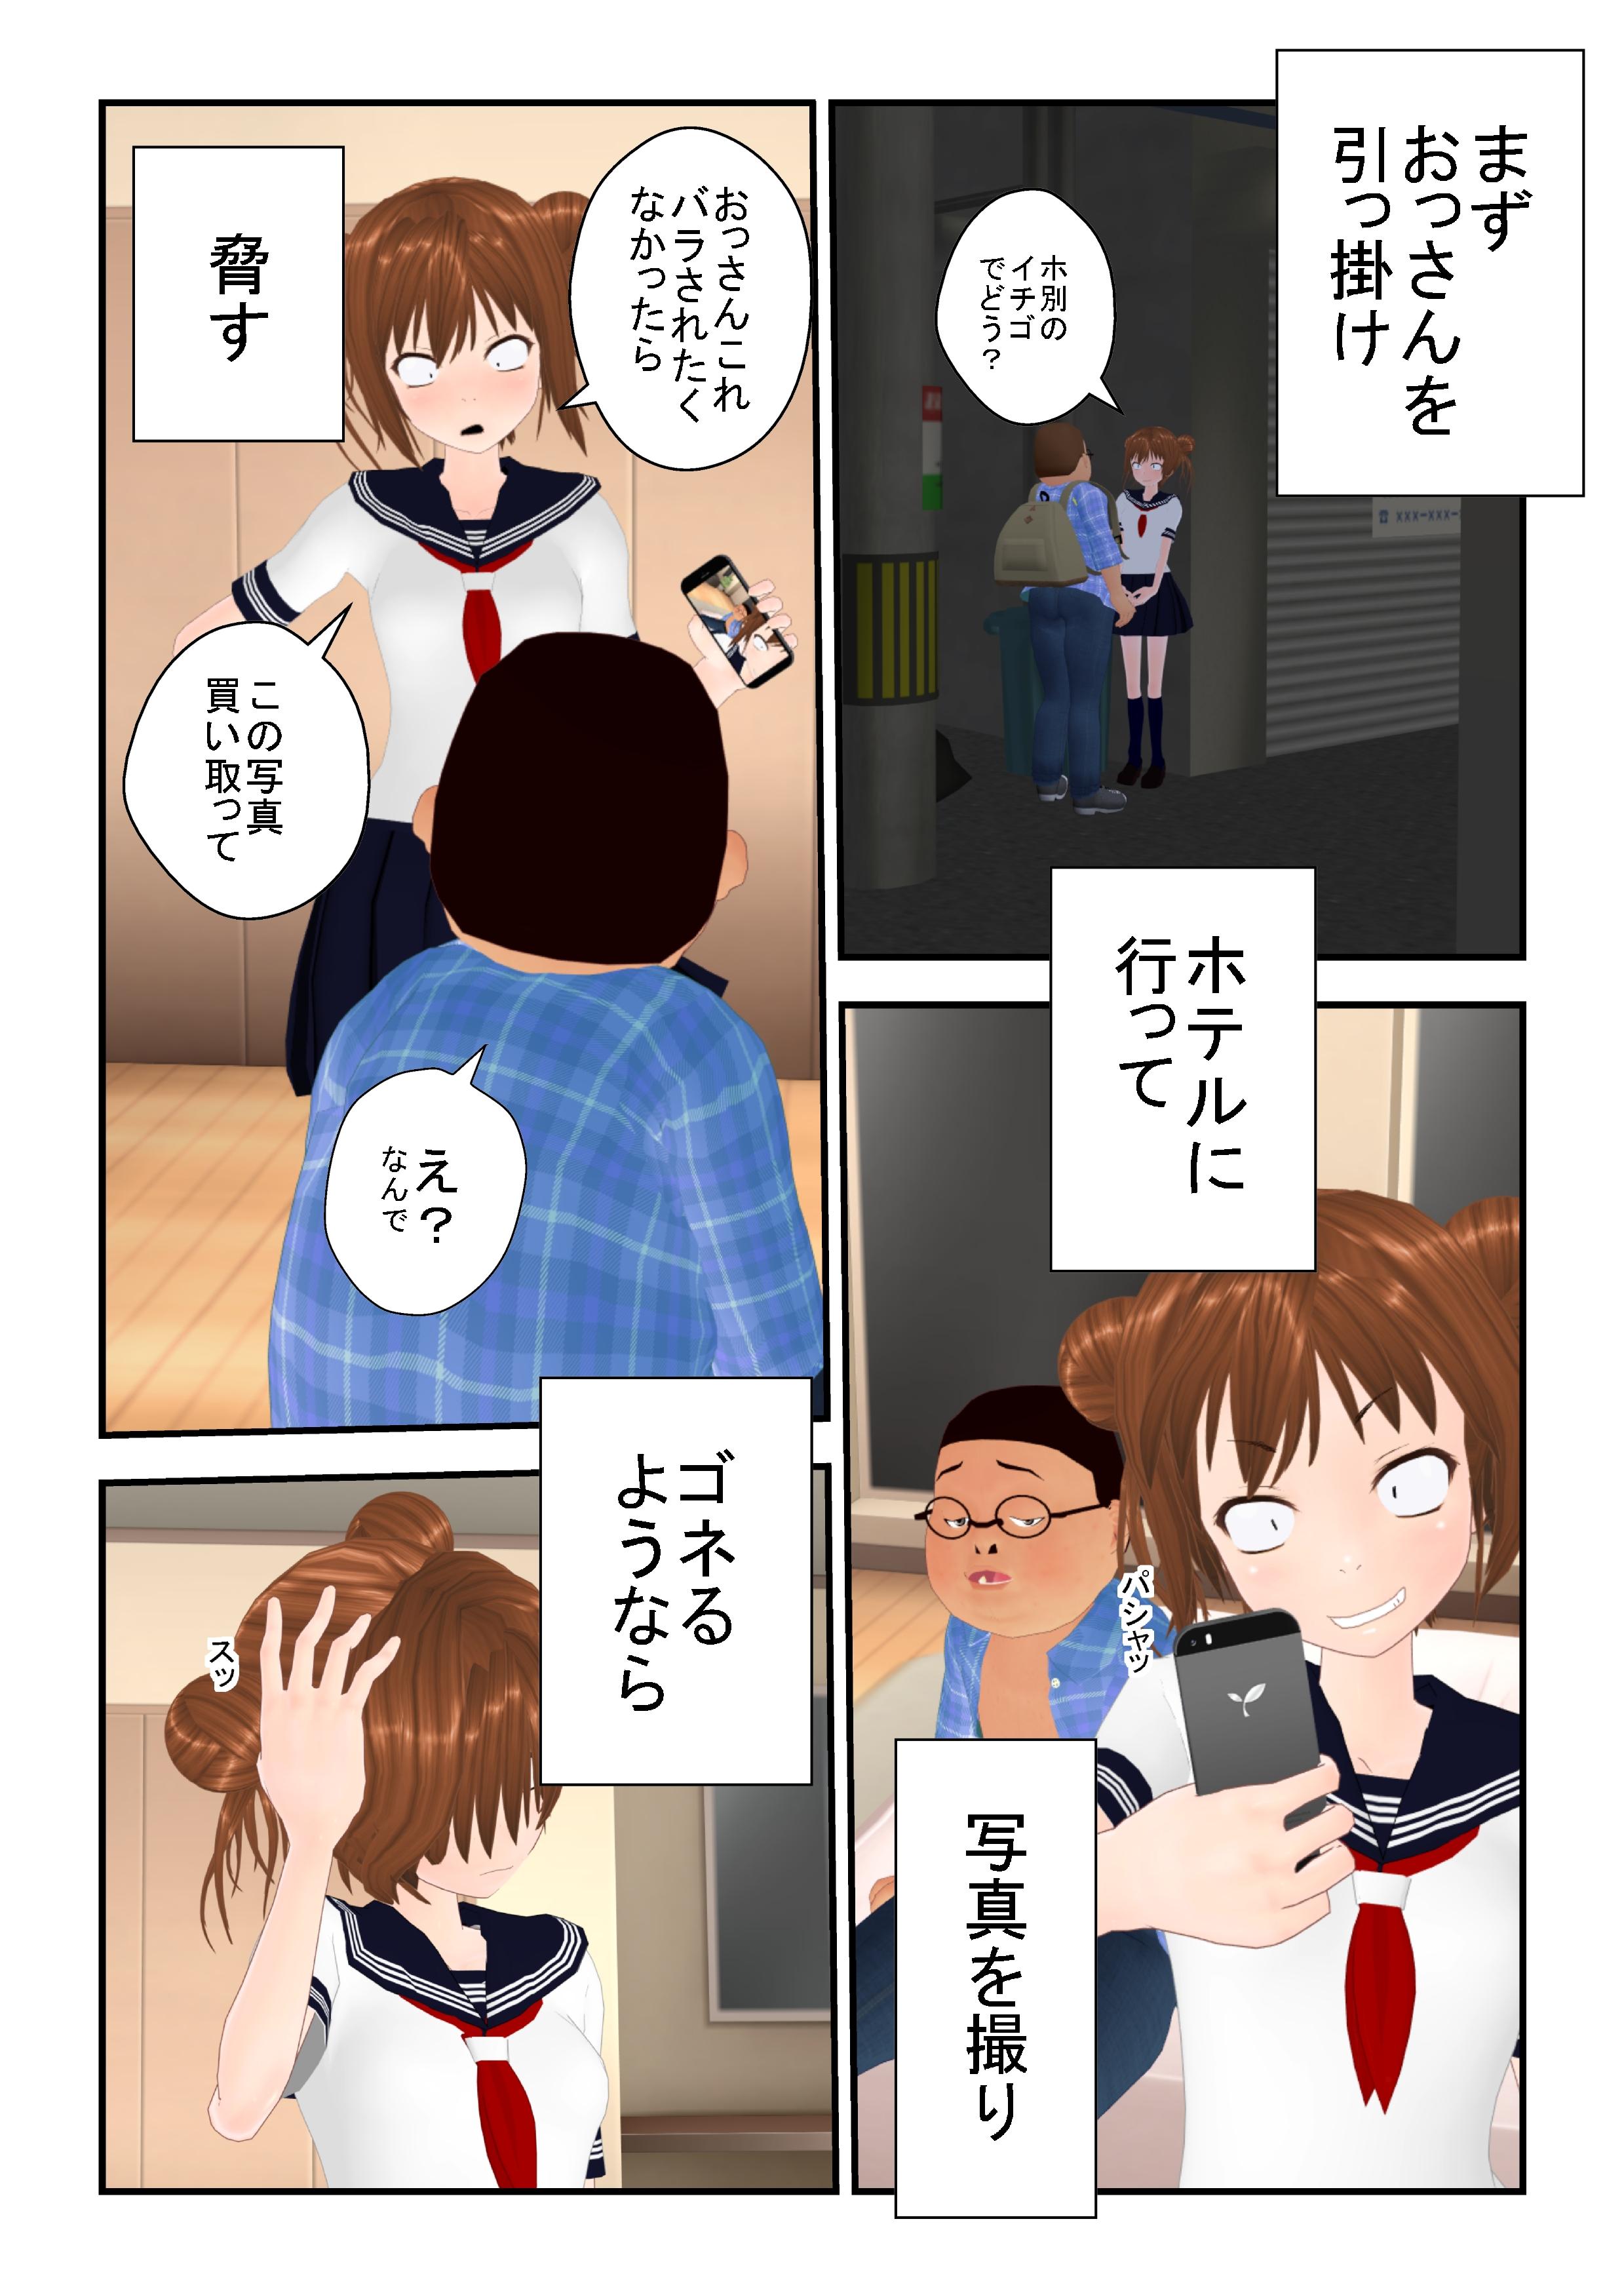 muteki_0002.jpg